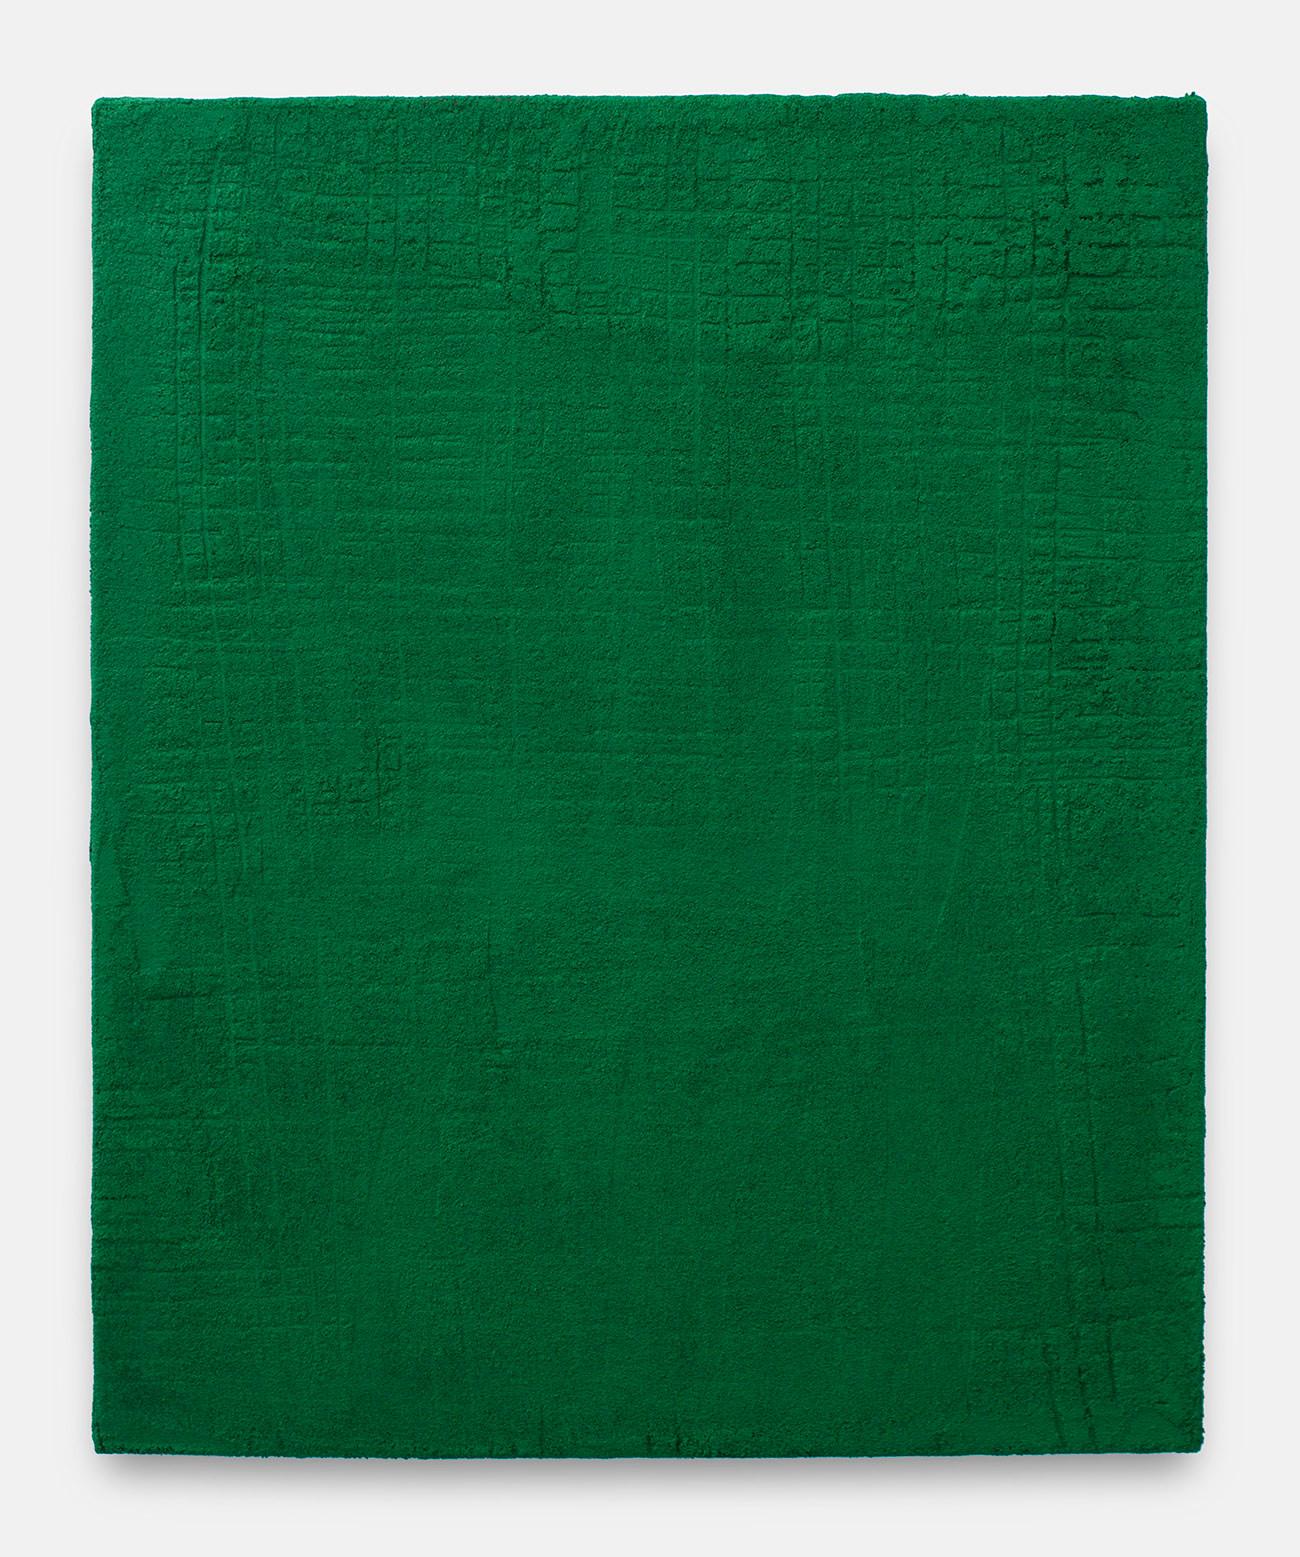 Sin título, 2017. Acrylic, sand and limestone on linen. 73 x 60,5 cm.(verde)73 x 60.5_